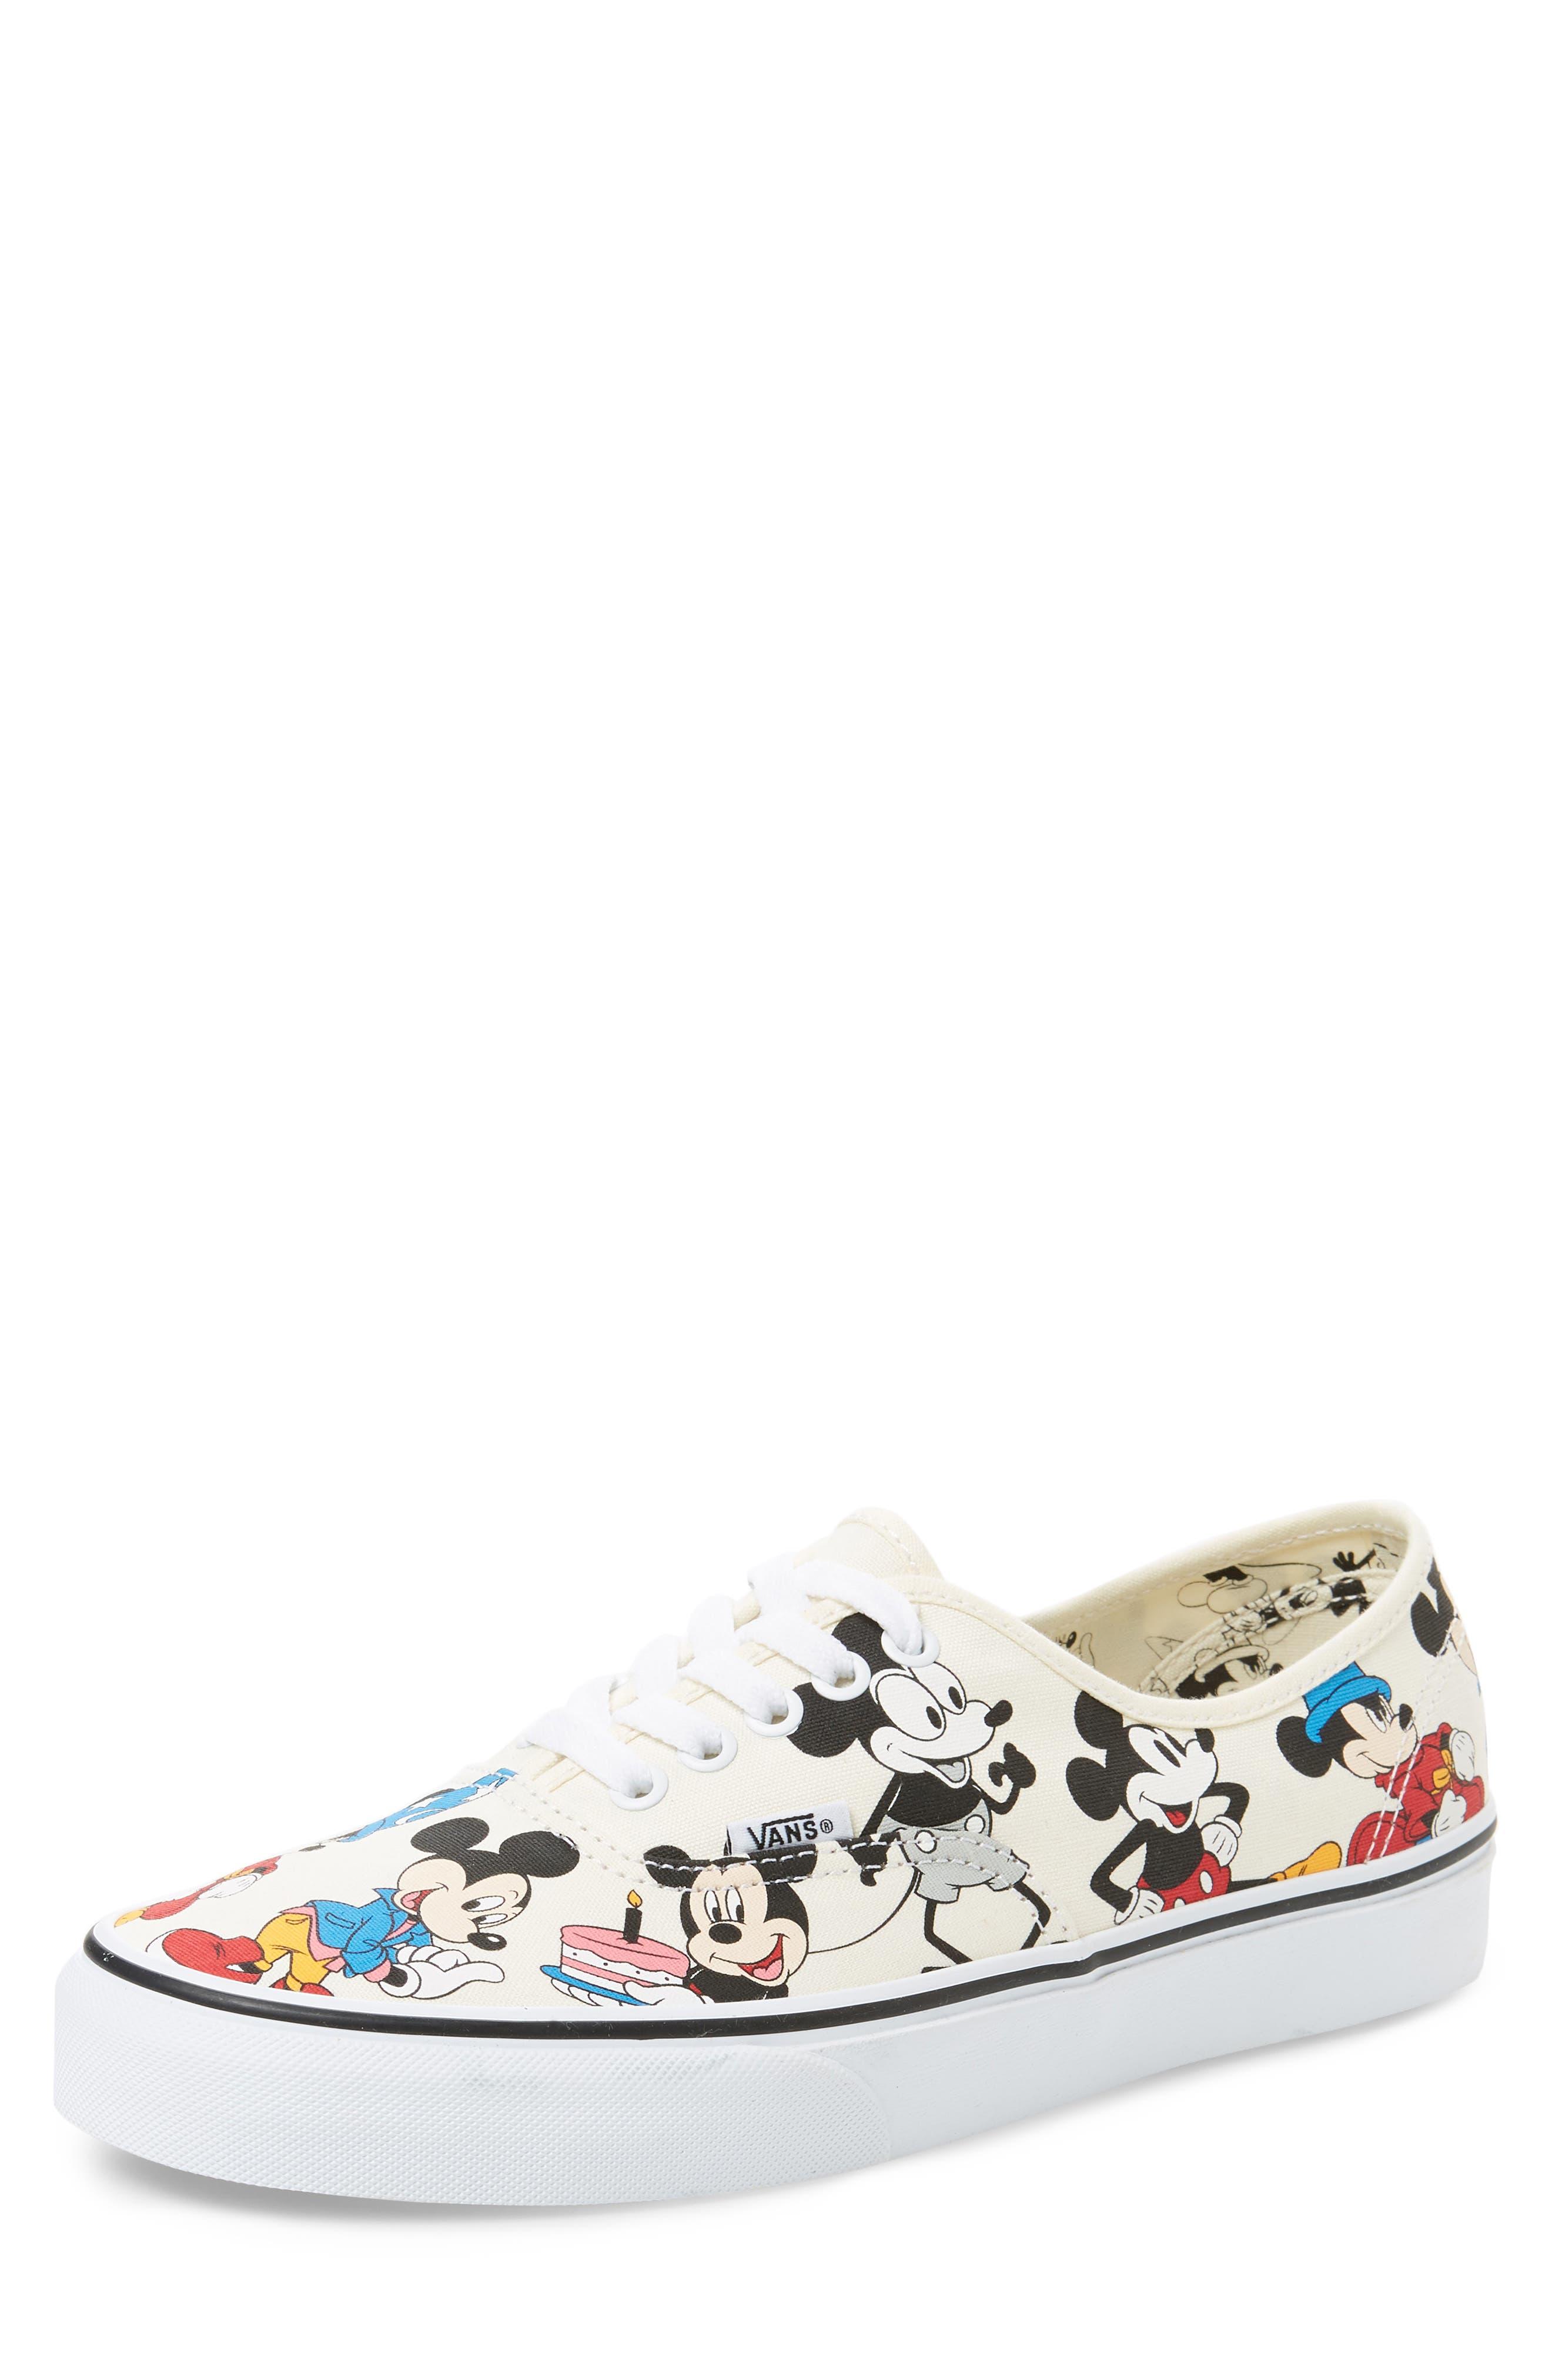 VANS x Disney Authentic Low Top Sneaker, Main, color, 250